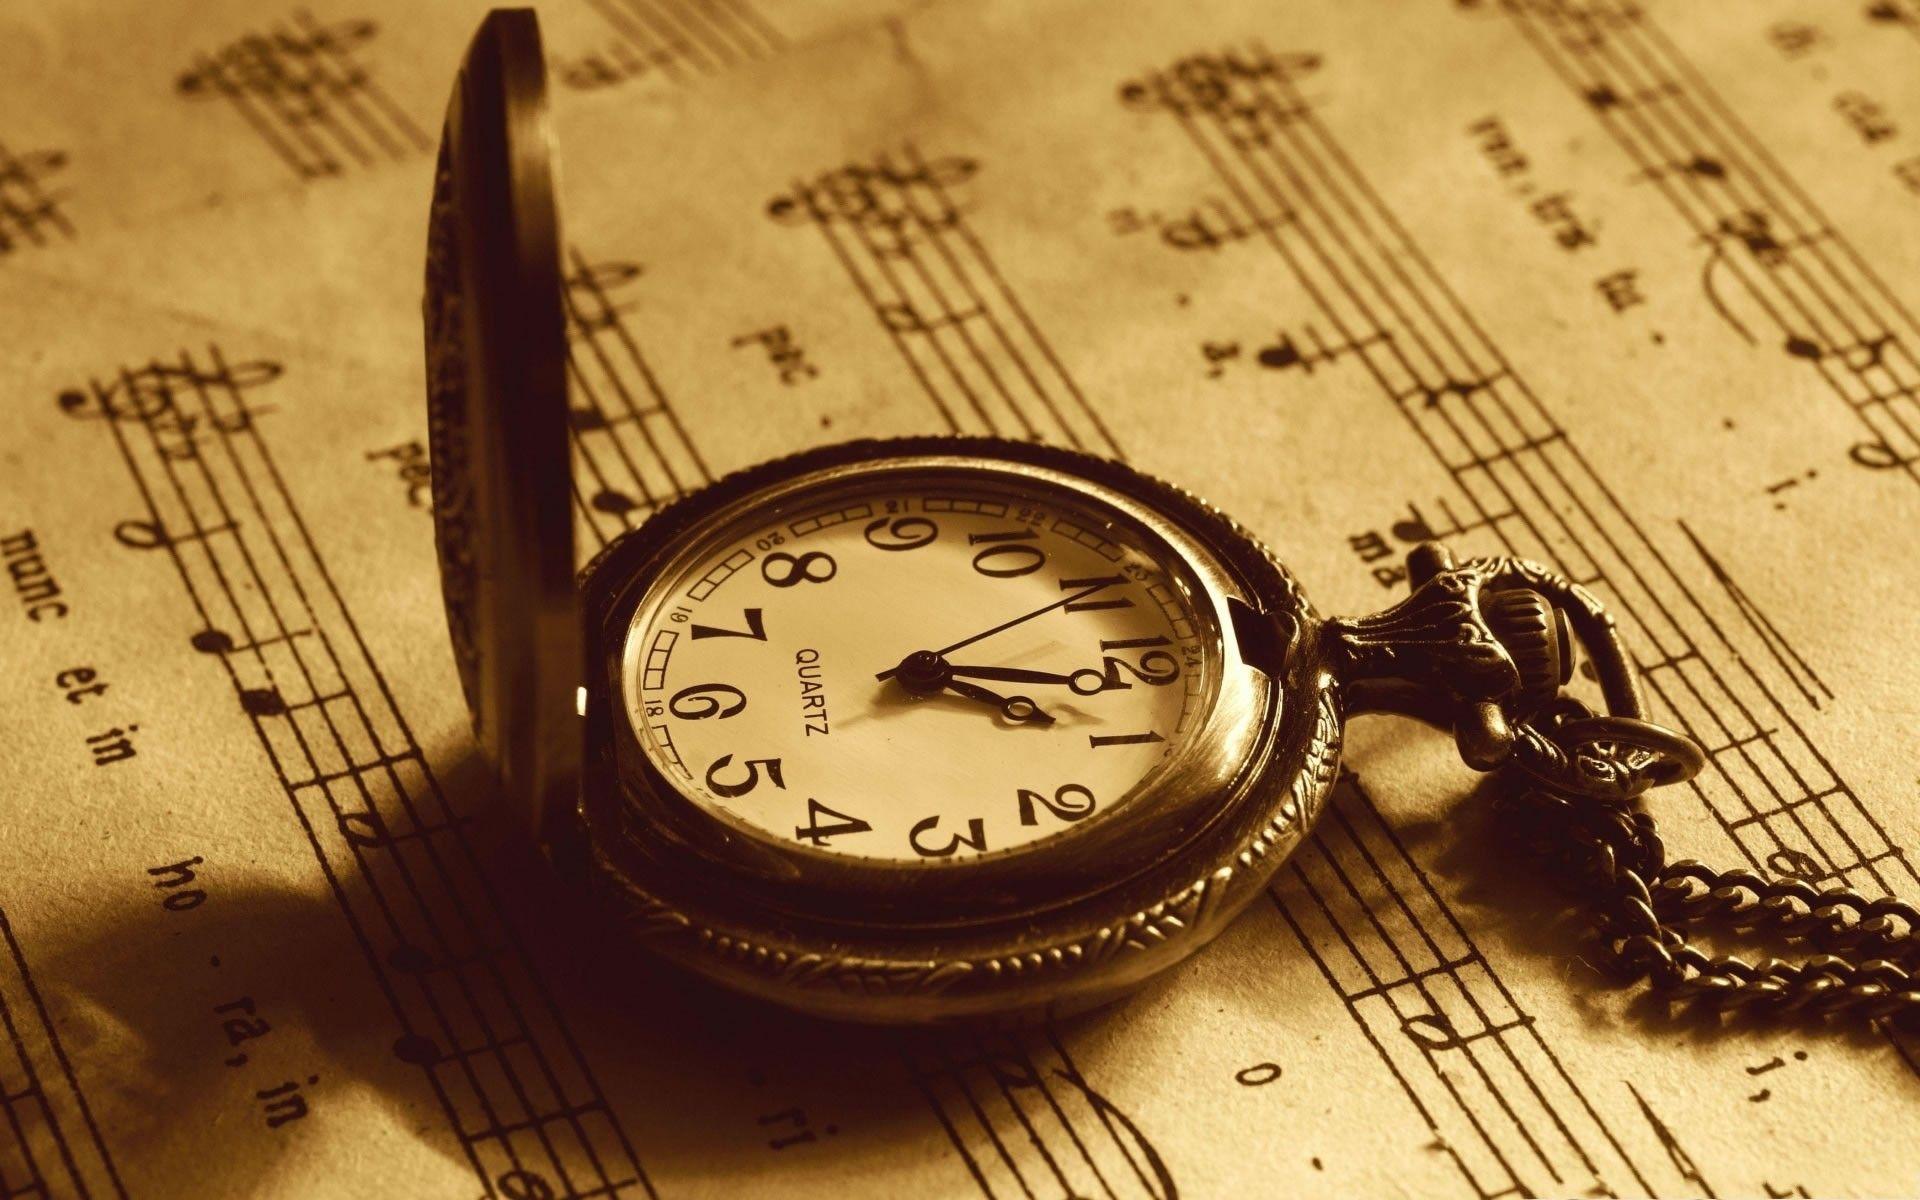 Clocks Musical Notes Paper Sepia Vintage Wallpapers Hd Pocket Watch Vintage Clock Vintage Music